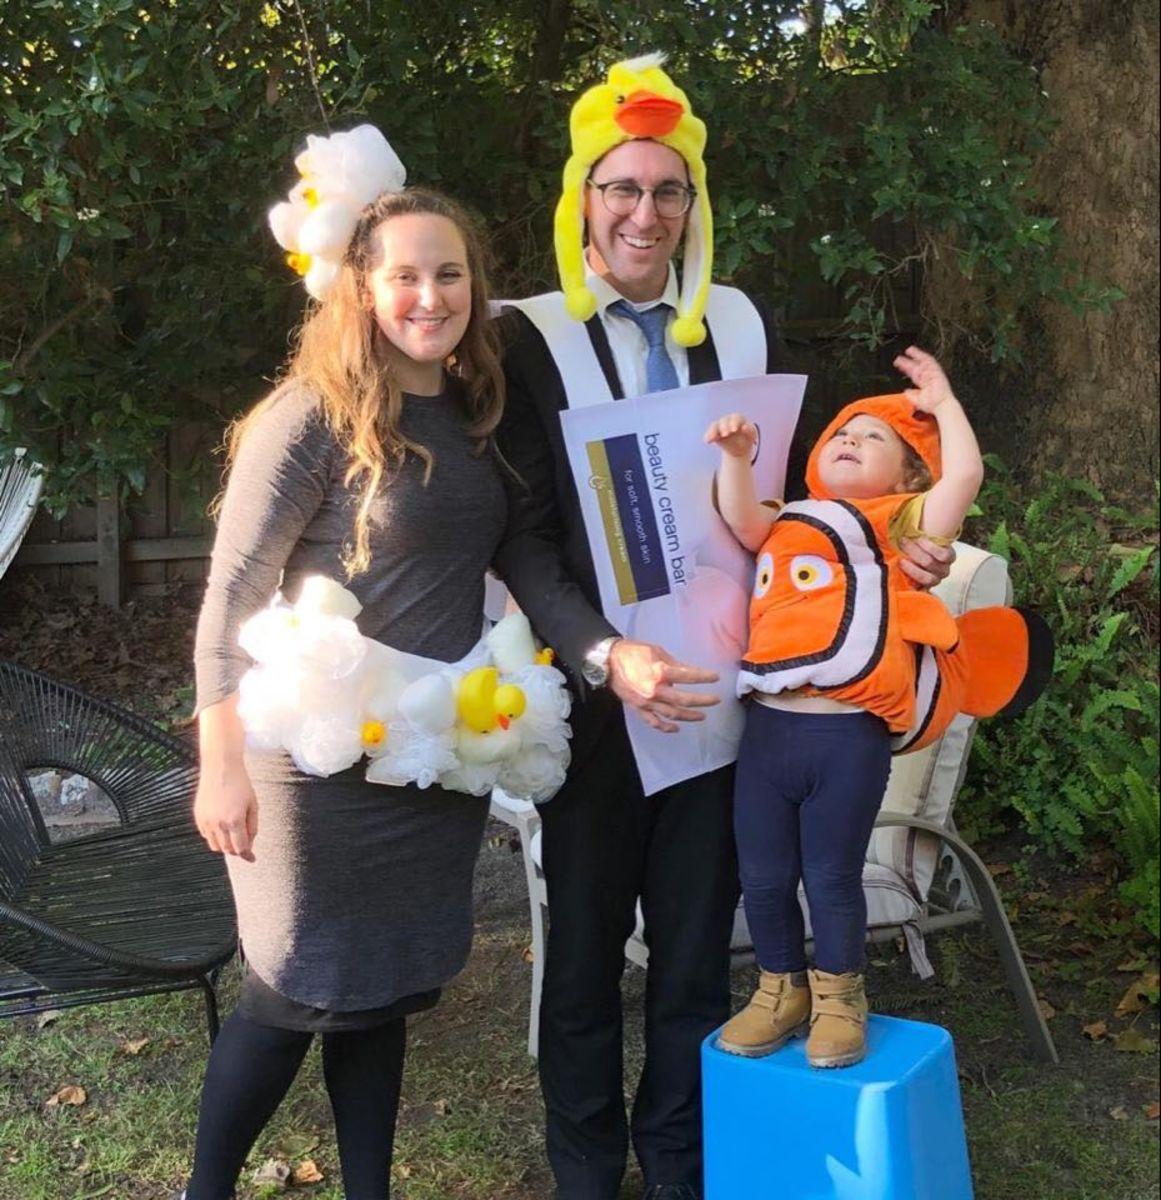 rub a dub family costume